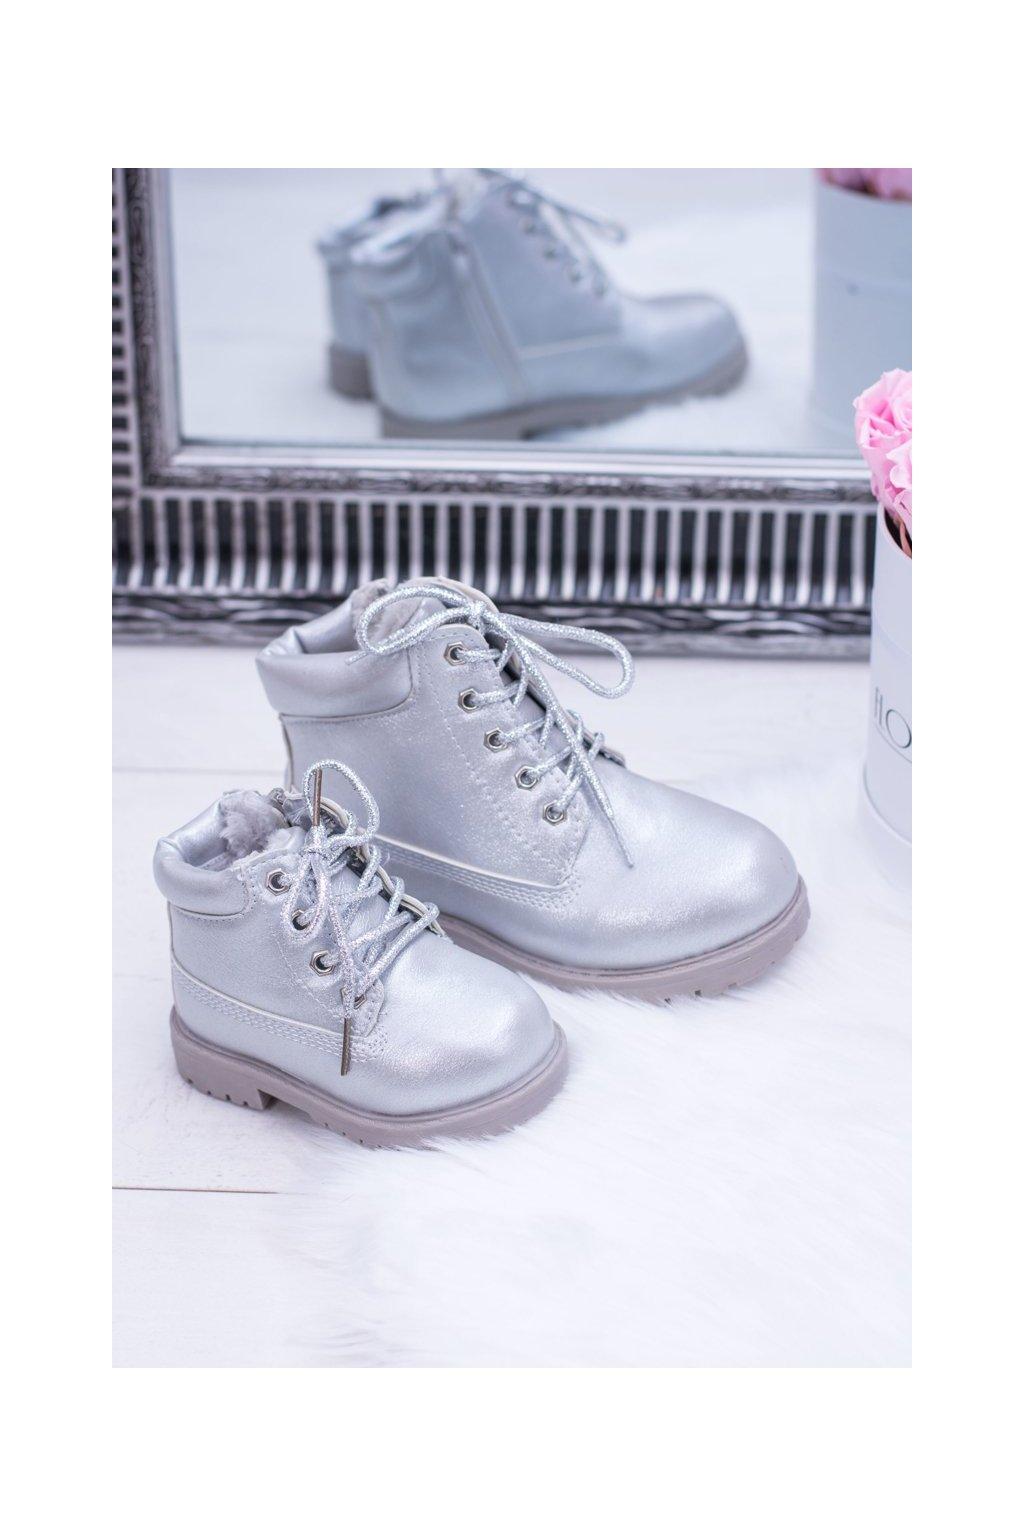 Detské členkové topánky farba sivá NJSK 20306-1G/2G/3G SILVER